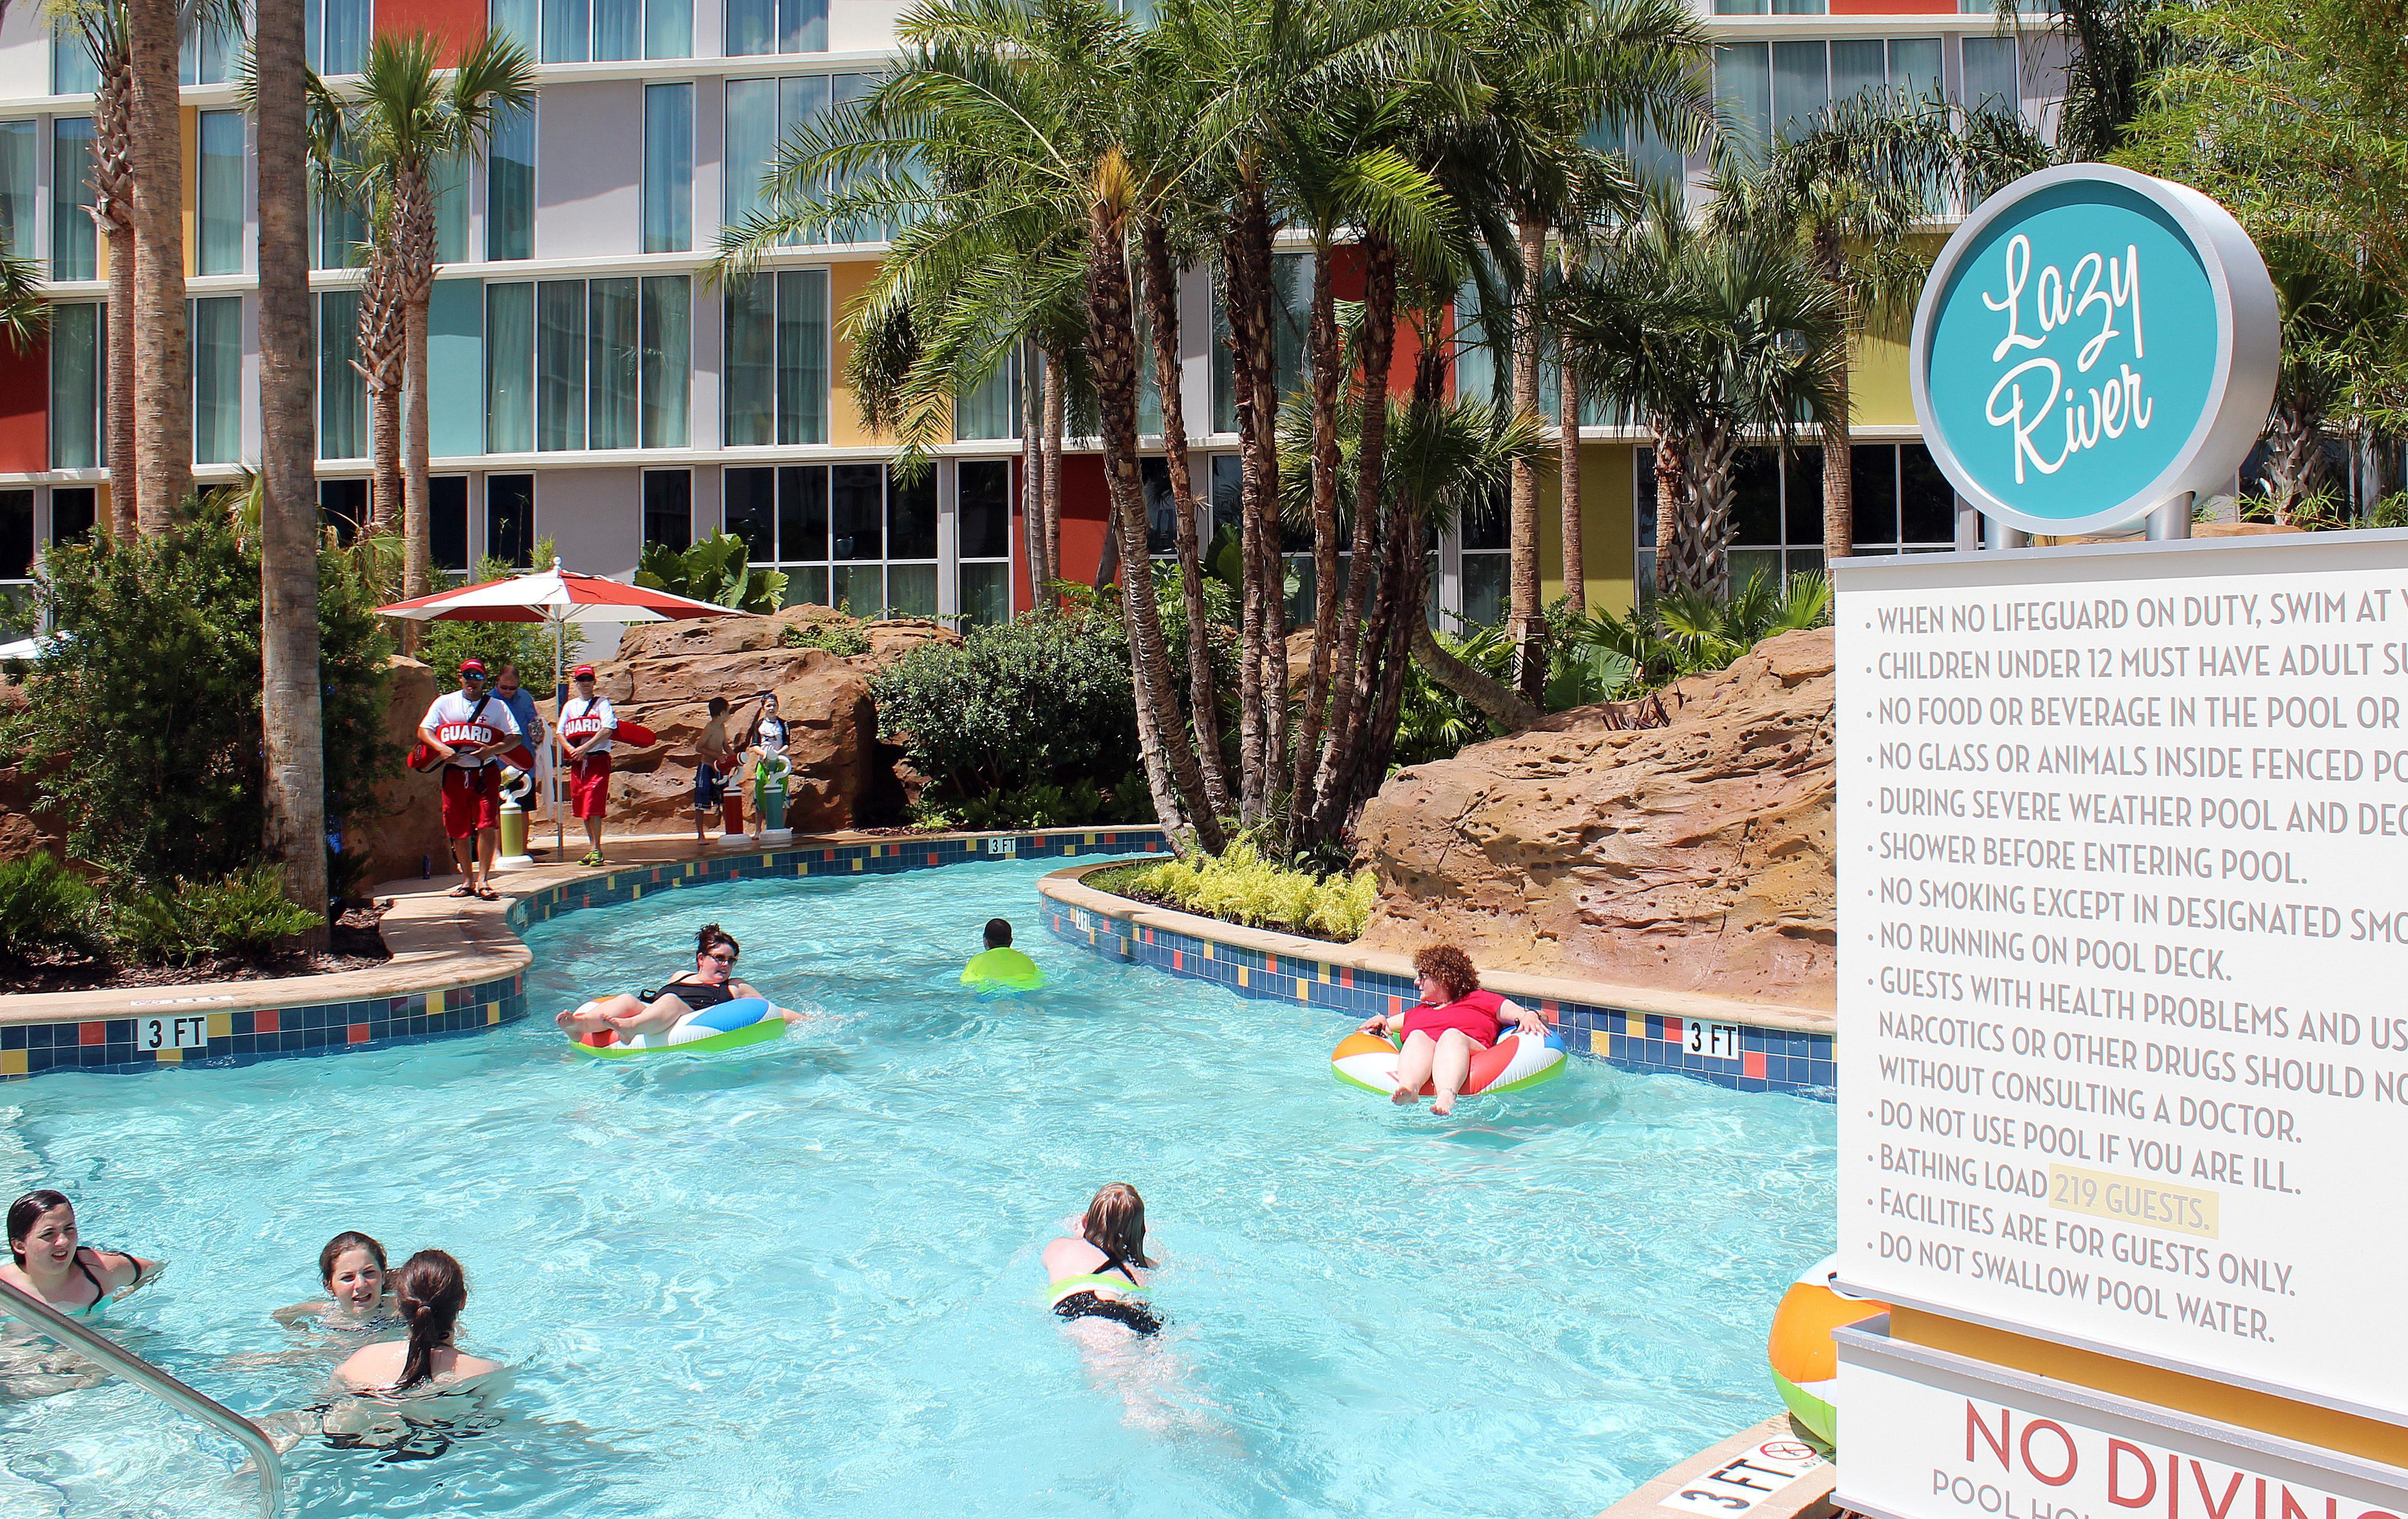 Cabana Bay Universal Orlando Lazy River